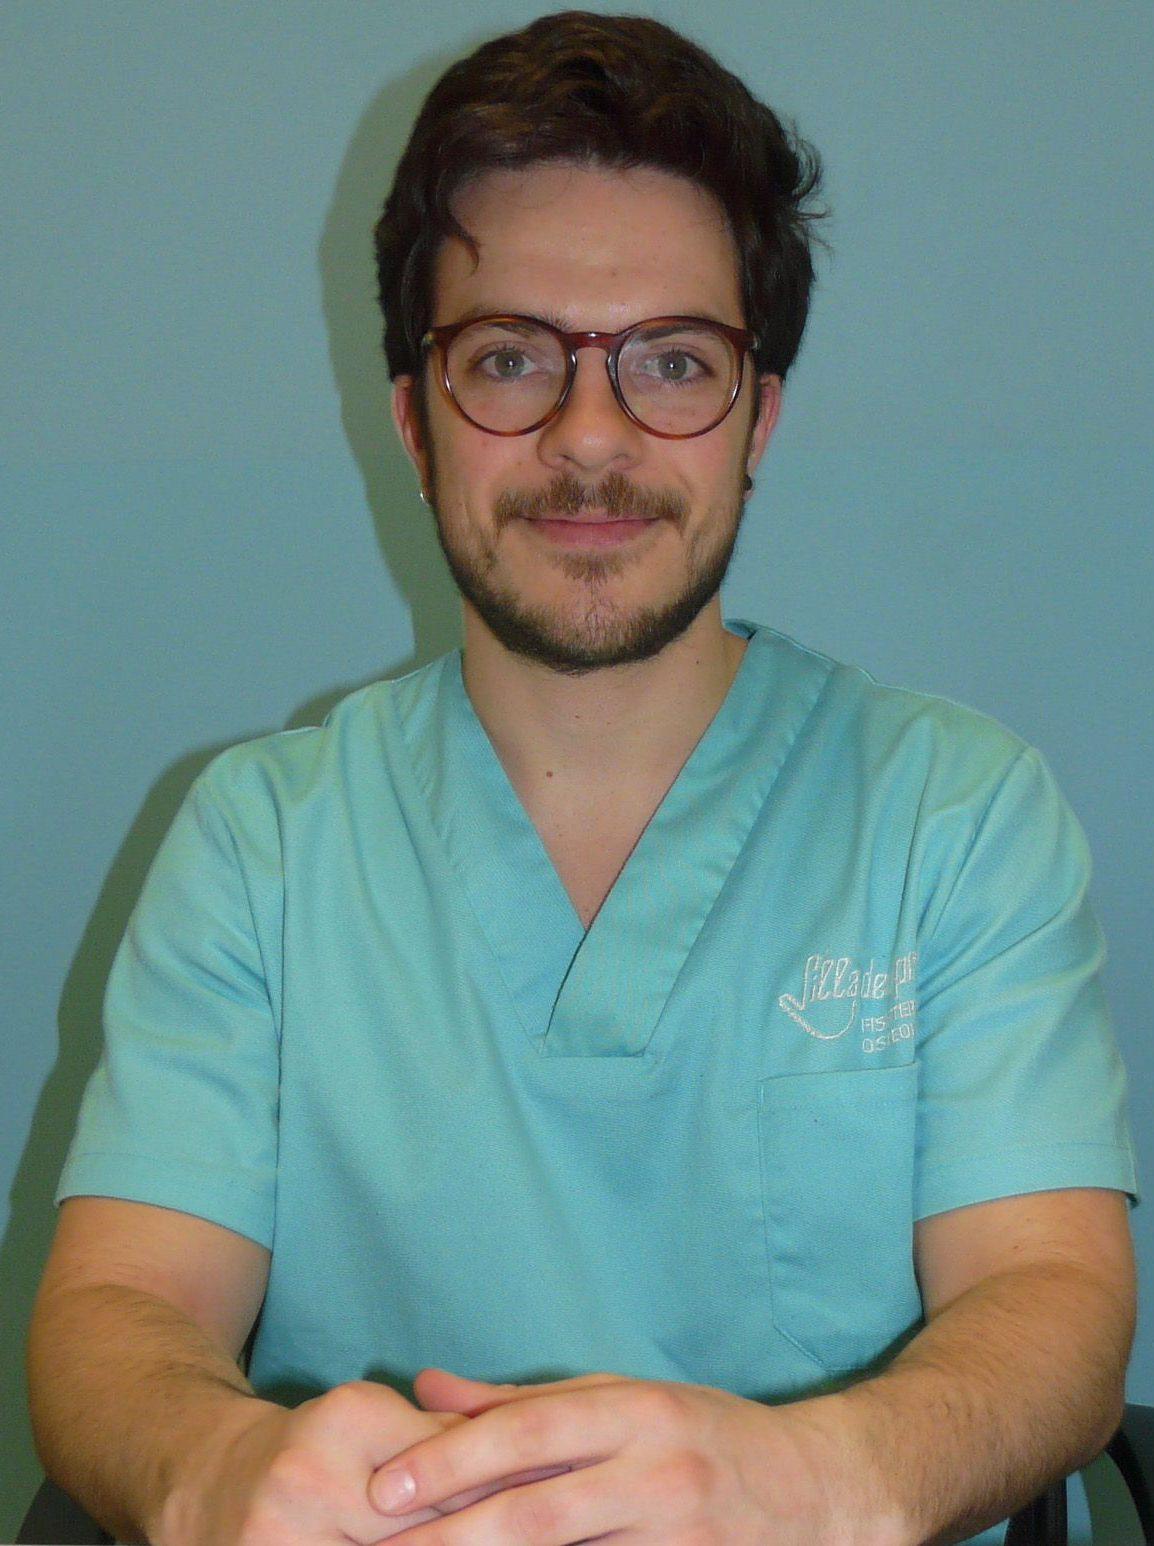 ALBERTO BARRASA